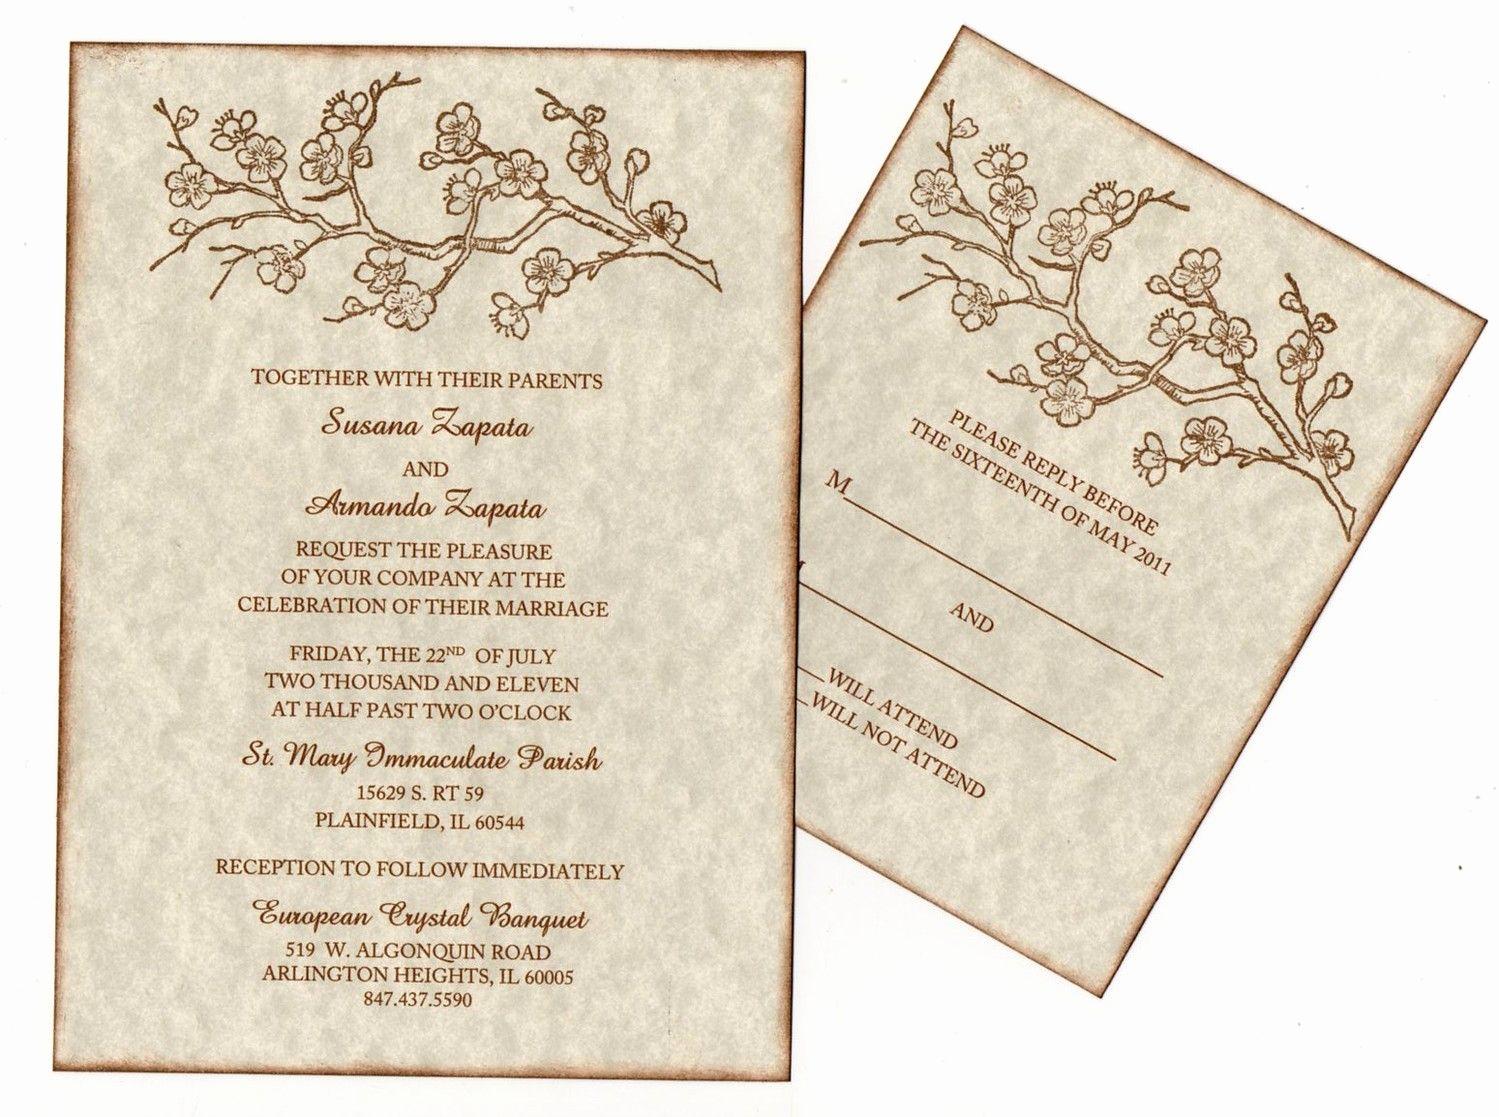 Indian Wedding Invitation Sample Inspirational Wedding Invitation Wording Indian Wedding Invitation